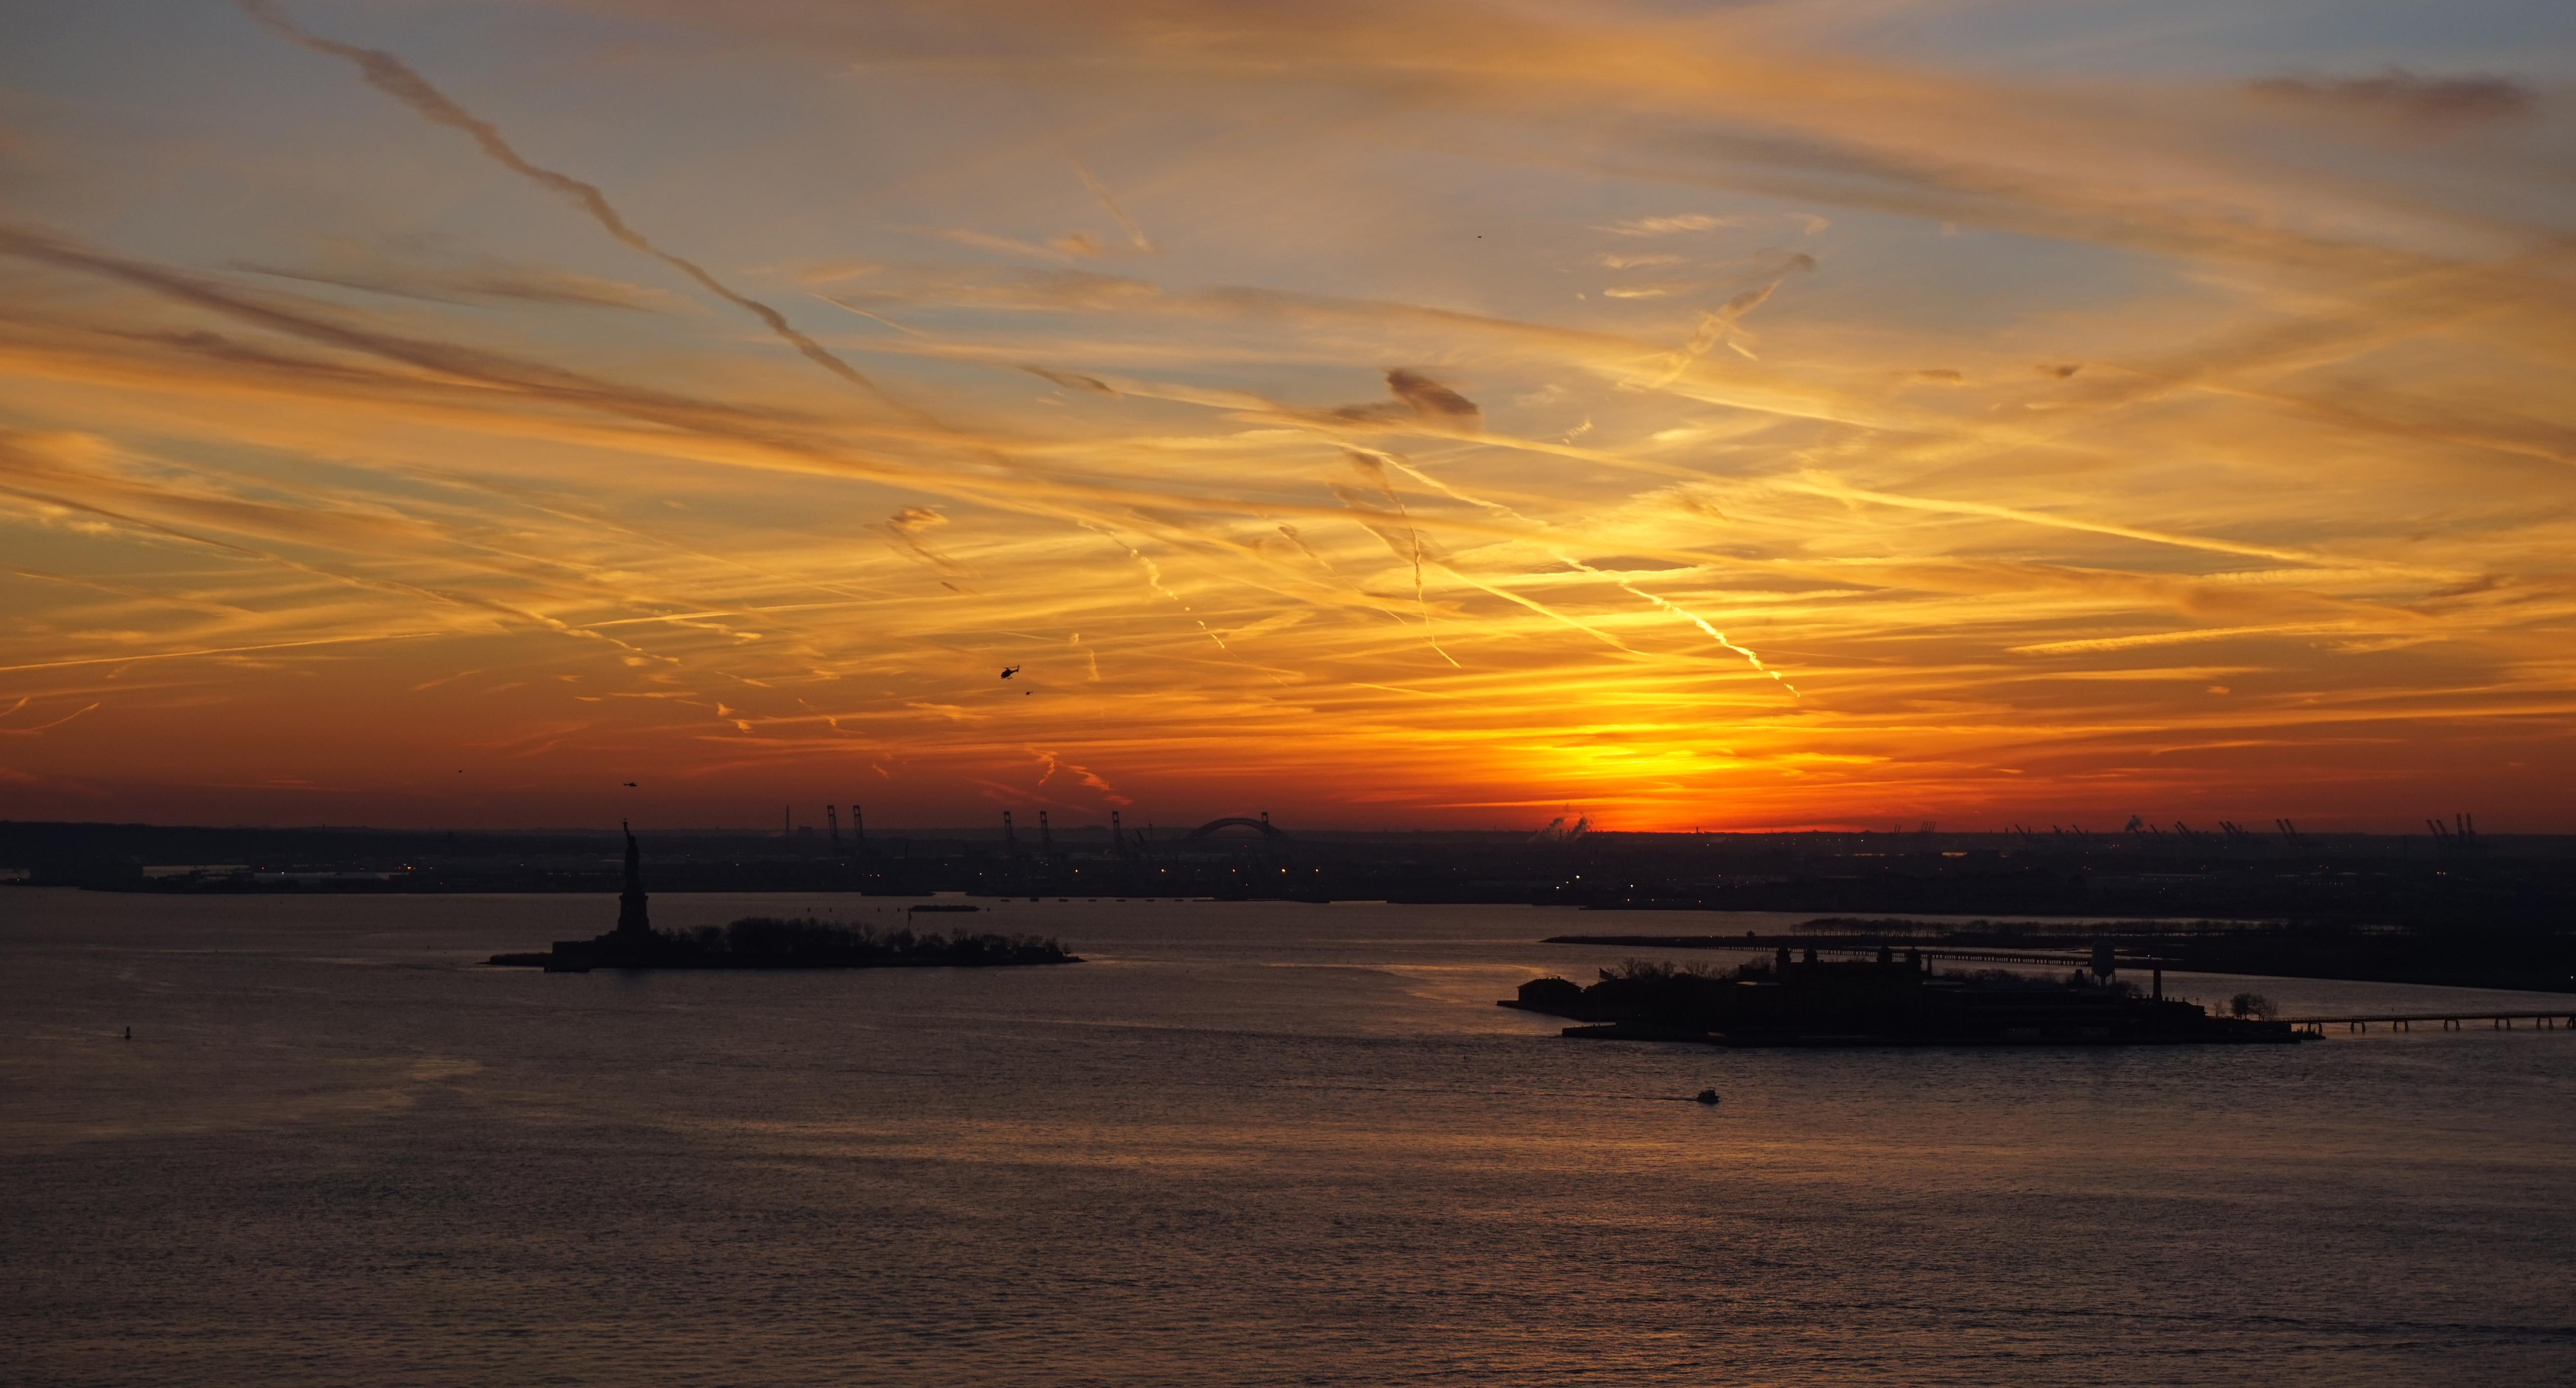 Sunset over New York Harbor 12-27-2014 zoom